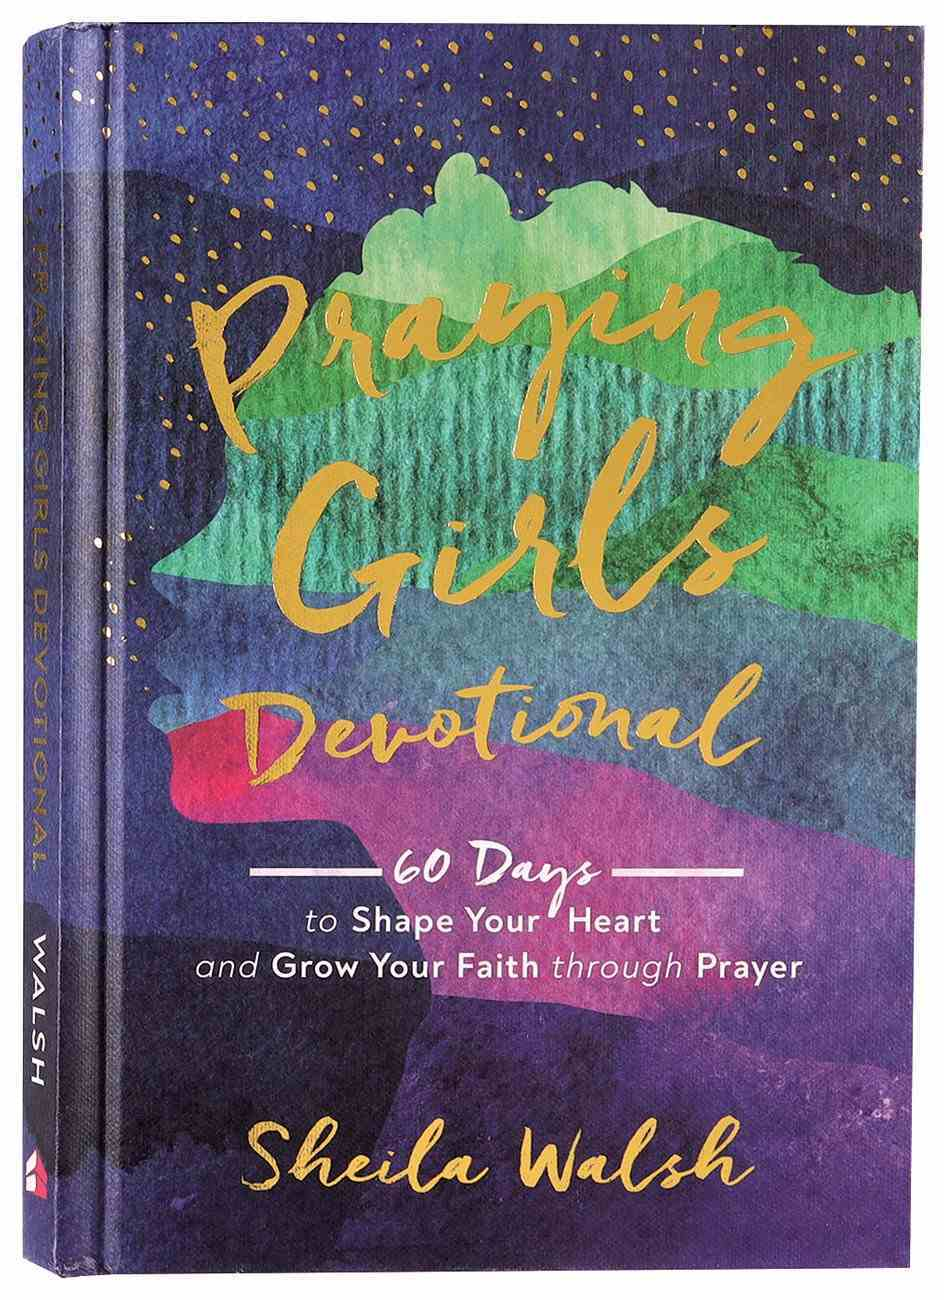 Praying Girls Devotional: 60 Days to Shape Your Heart and Grow Your Faith Through Prayer Hardback